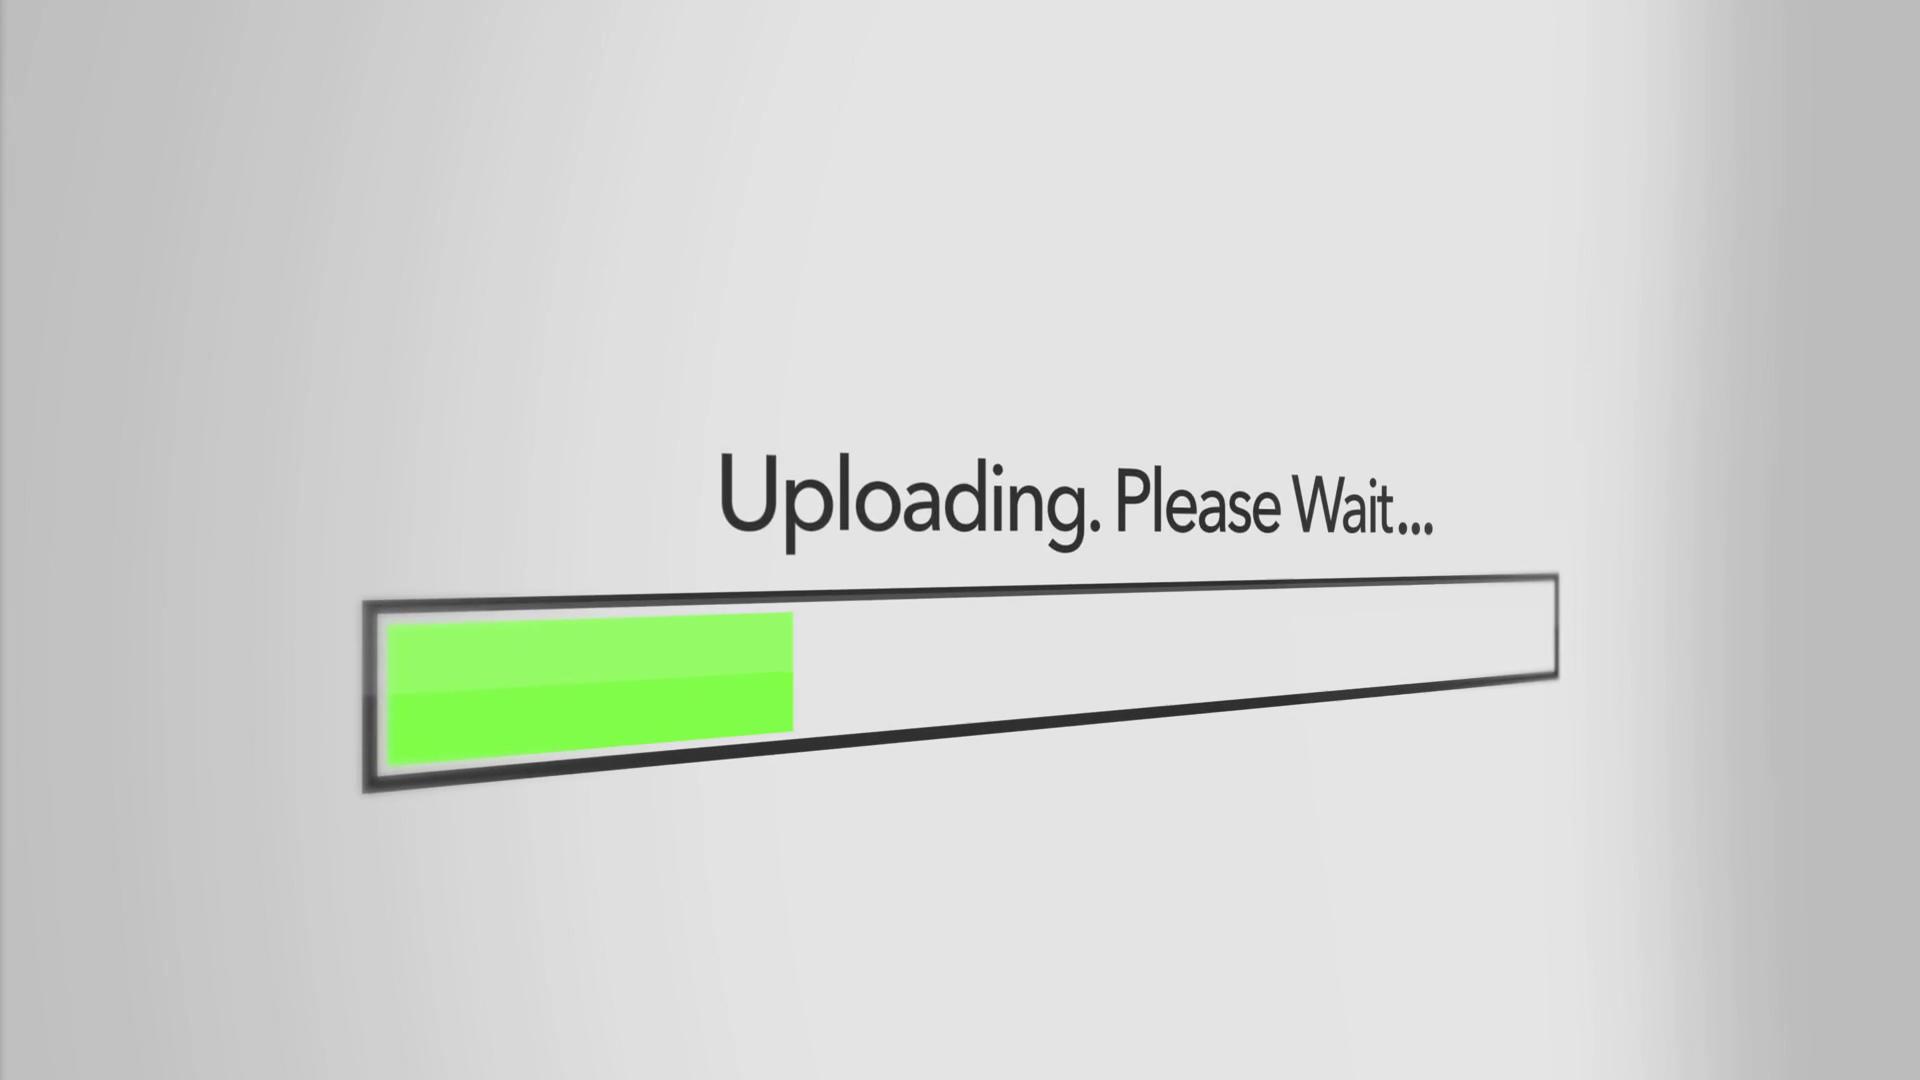 Uploading